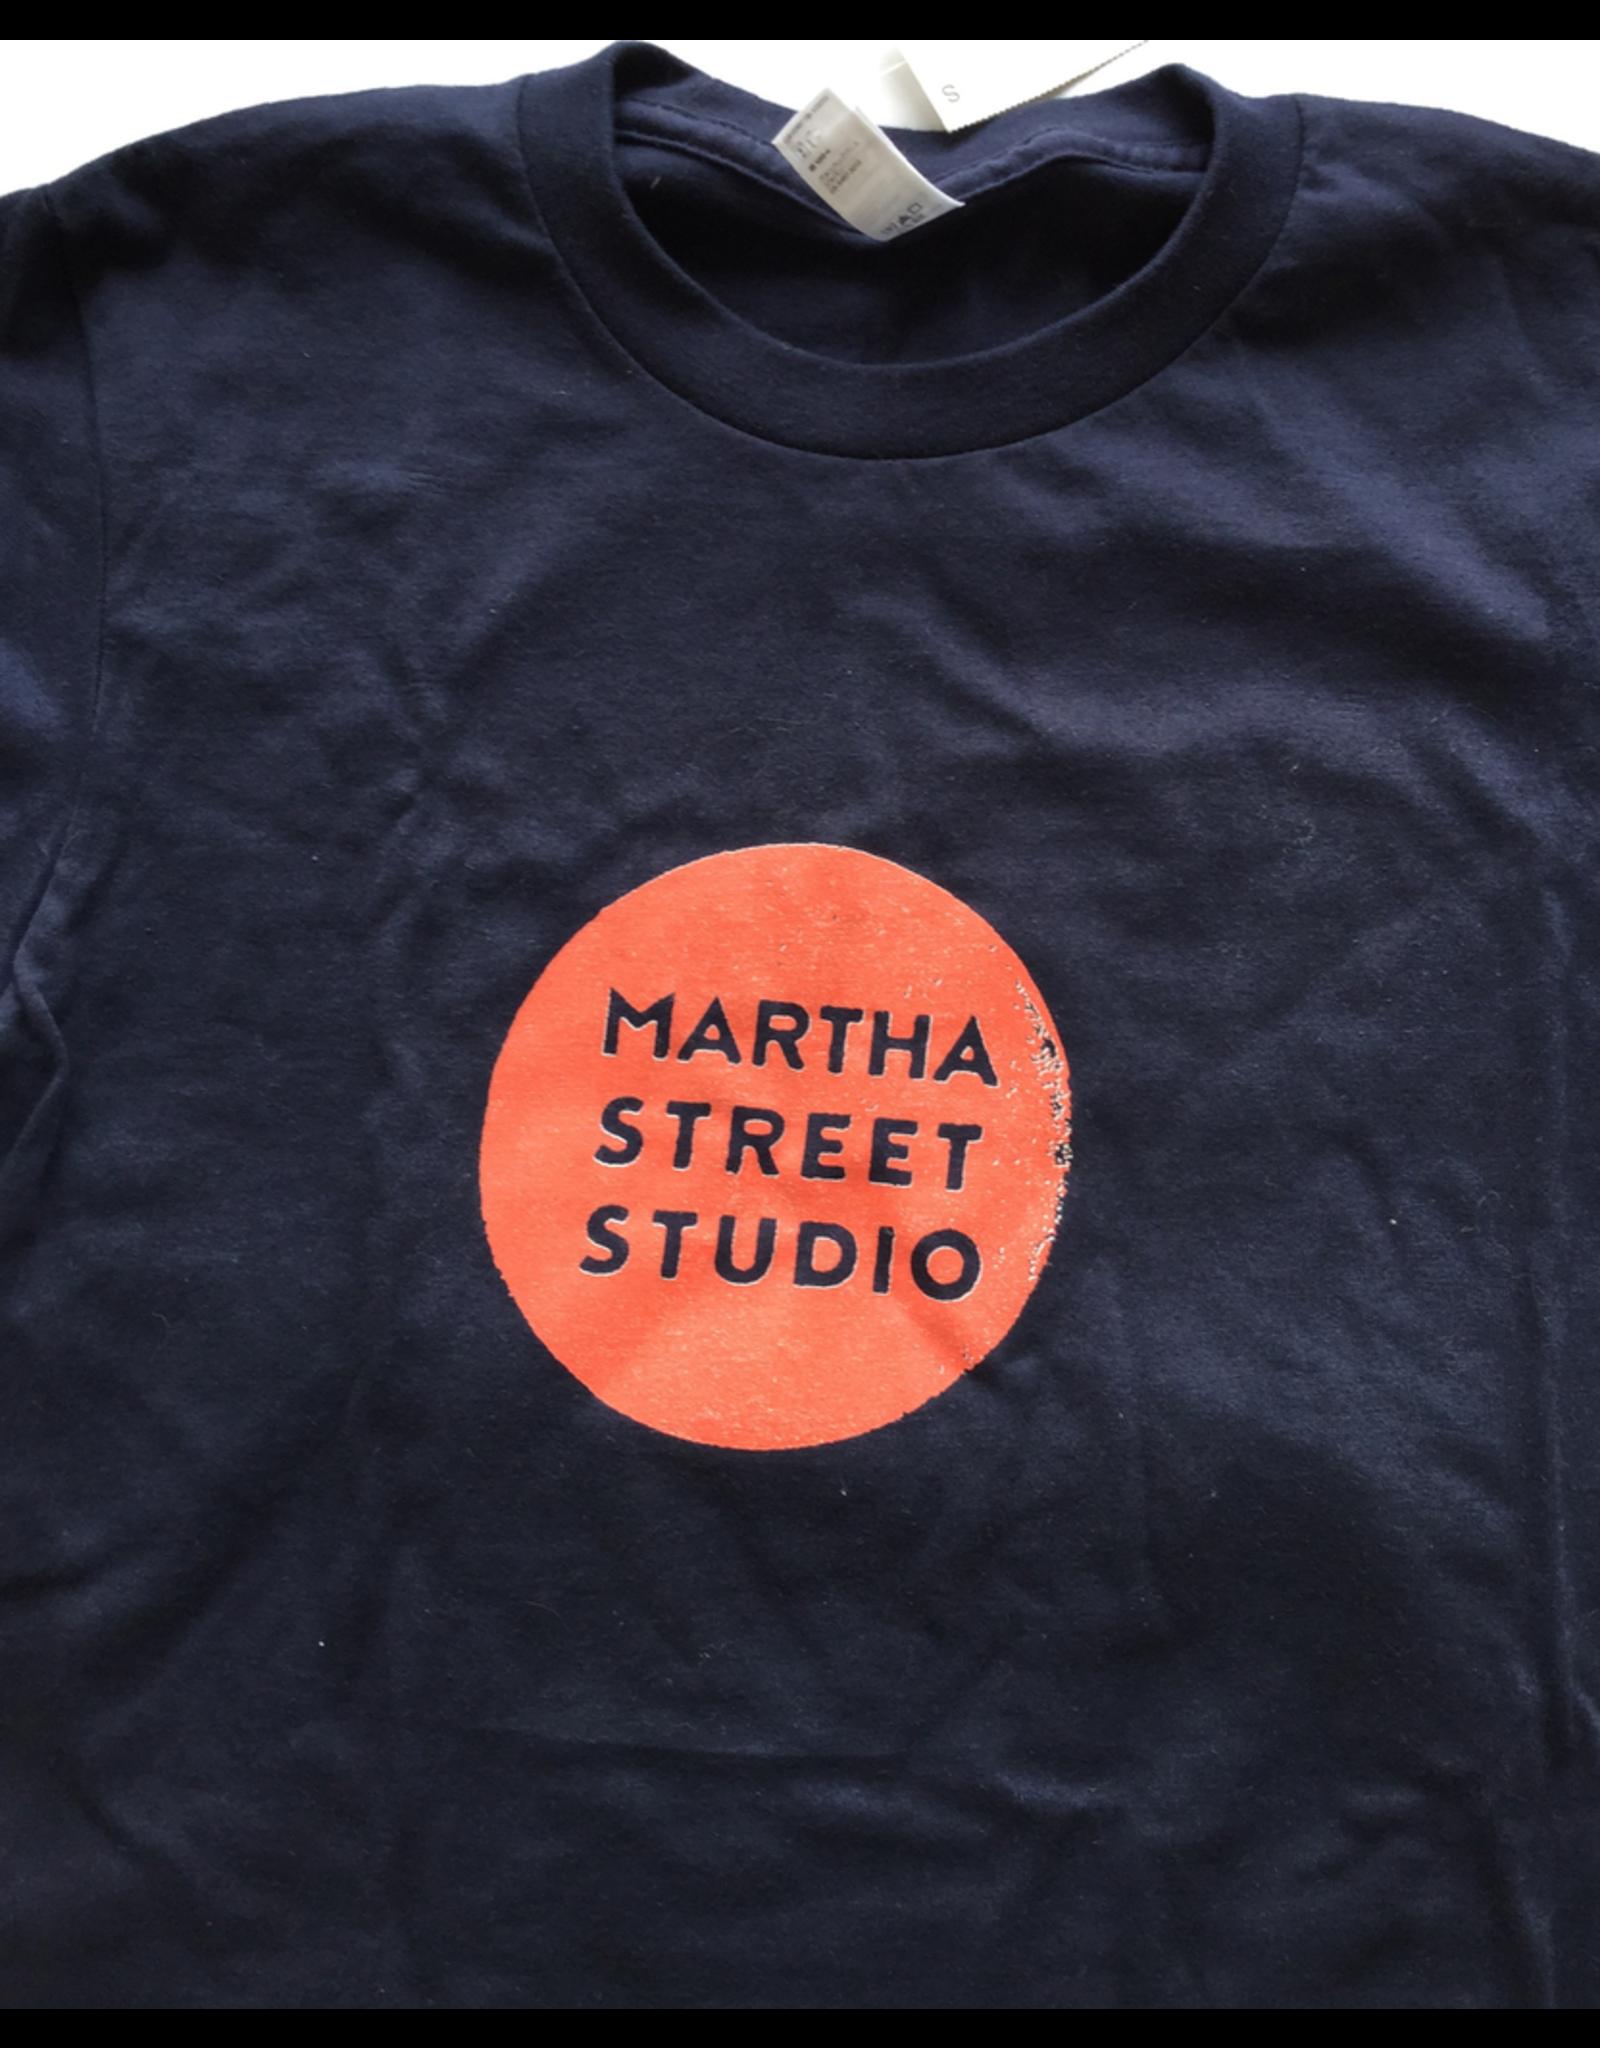 Martha Street Studio T-Shirt, Martha Street Studion Logo